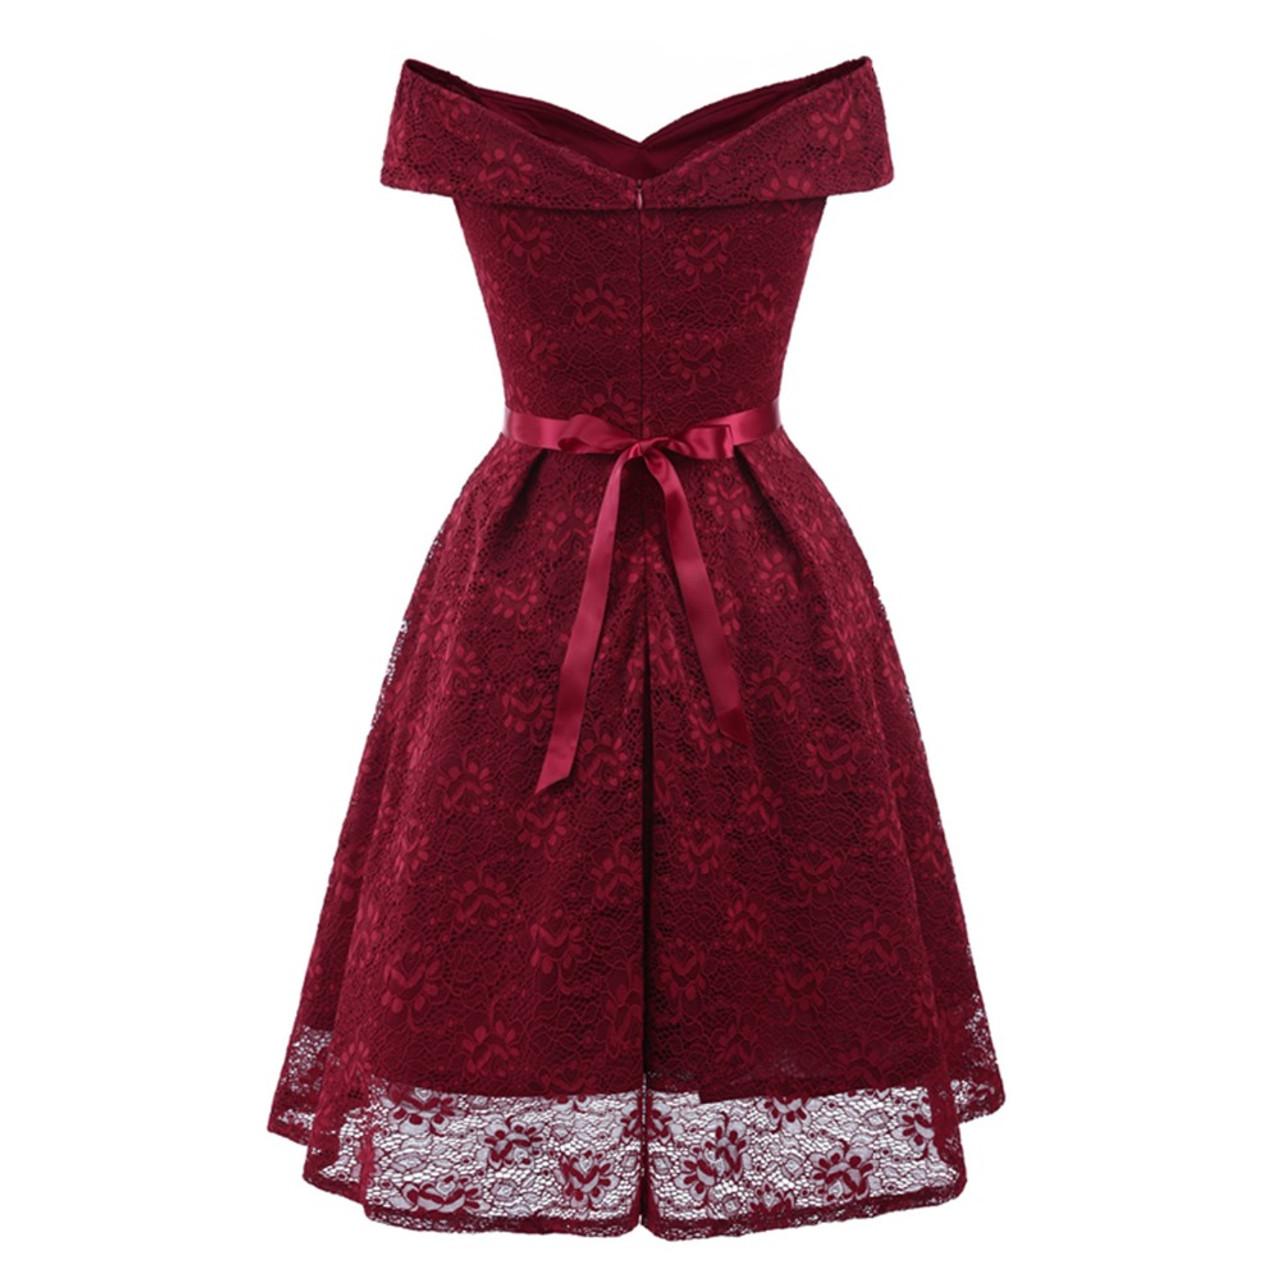 ... Robe Cocktail Party Dress 2018 Women Elegant A-Line Short Cocktail  Dresses Keen Length Burgundy ... 8e5d7d9bd